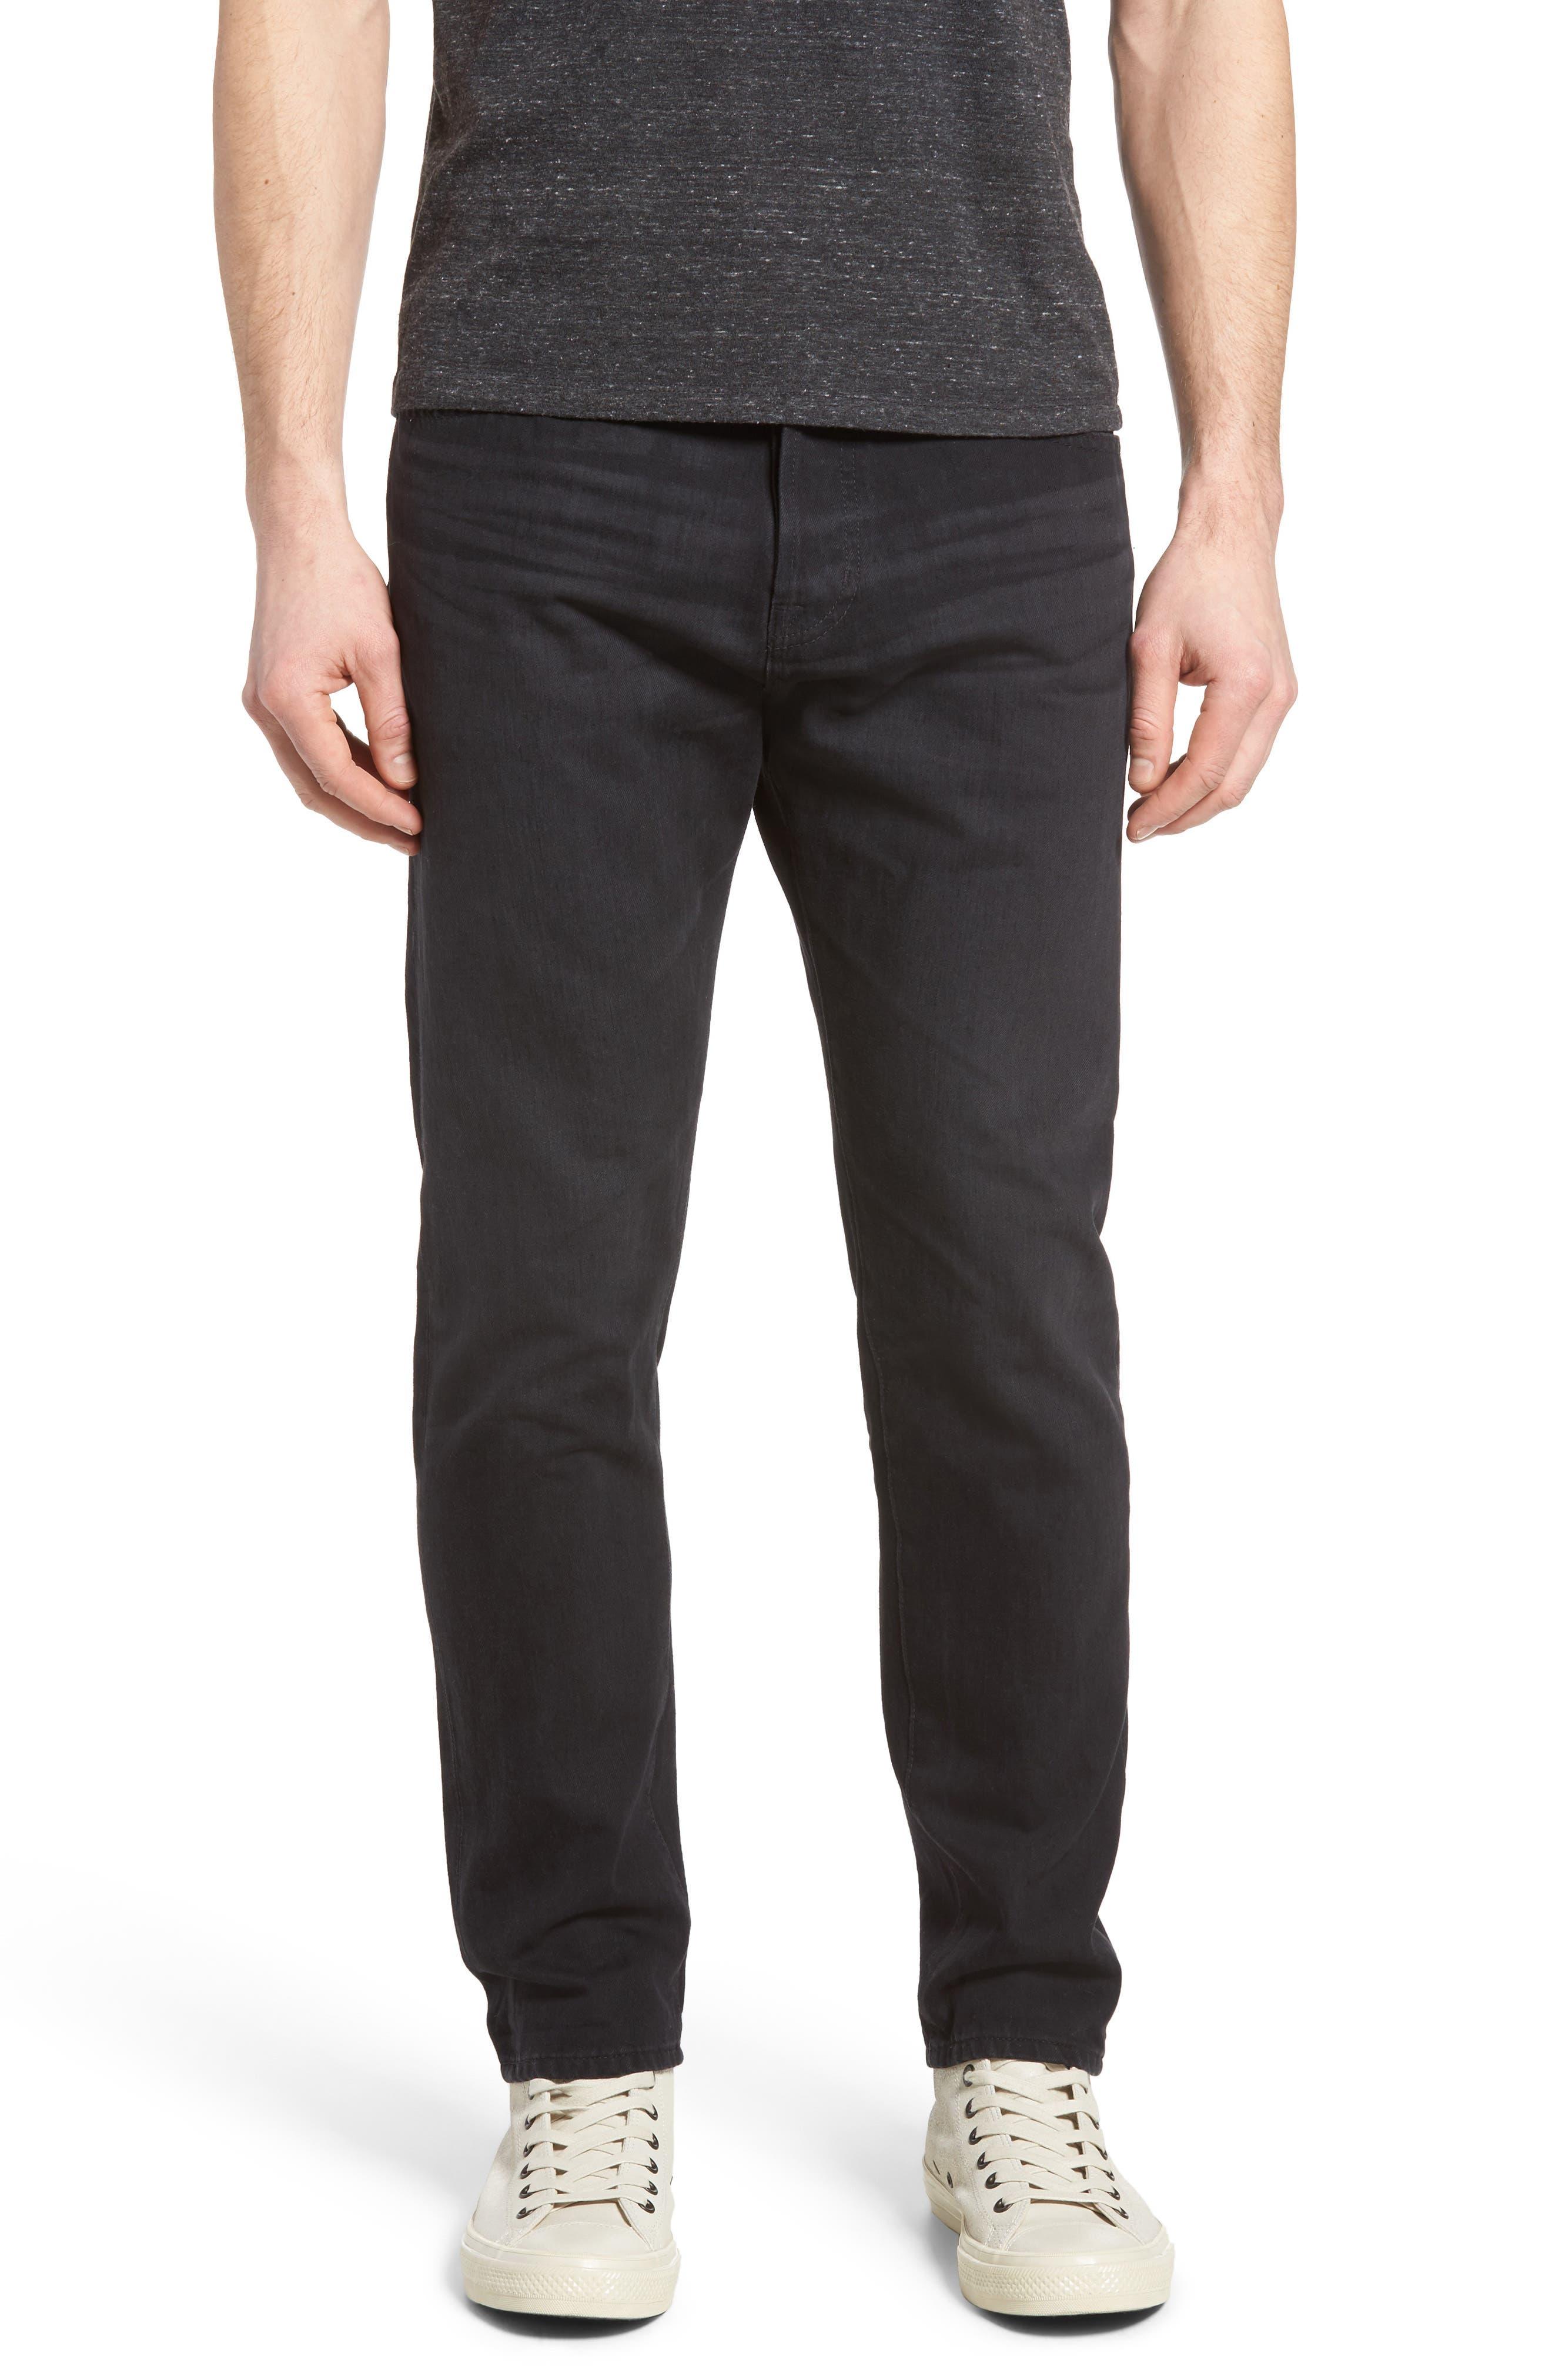 Apex Slouchy Slim Fit Jeans,                         Main,                         color,